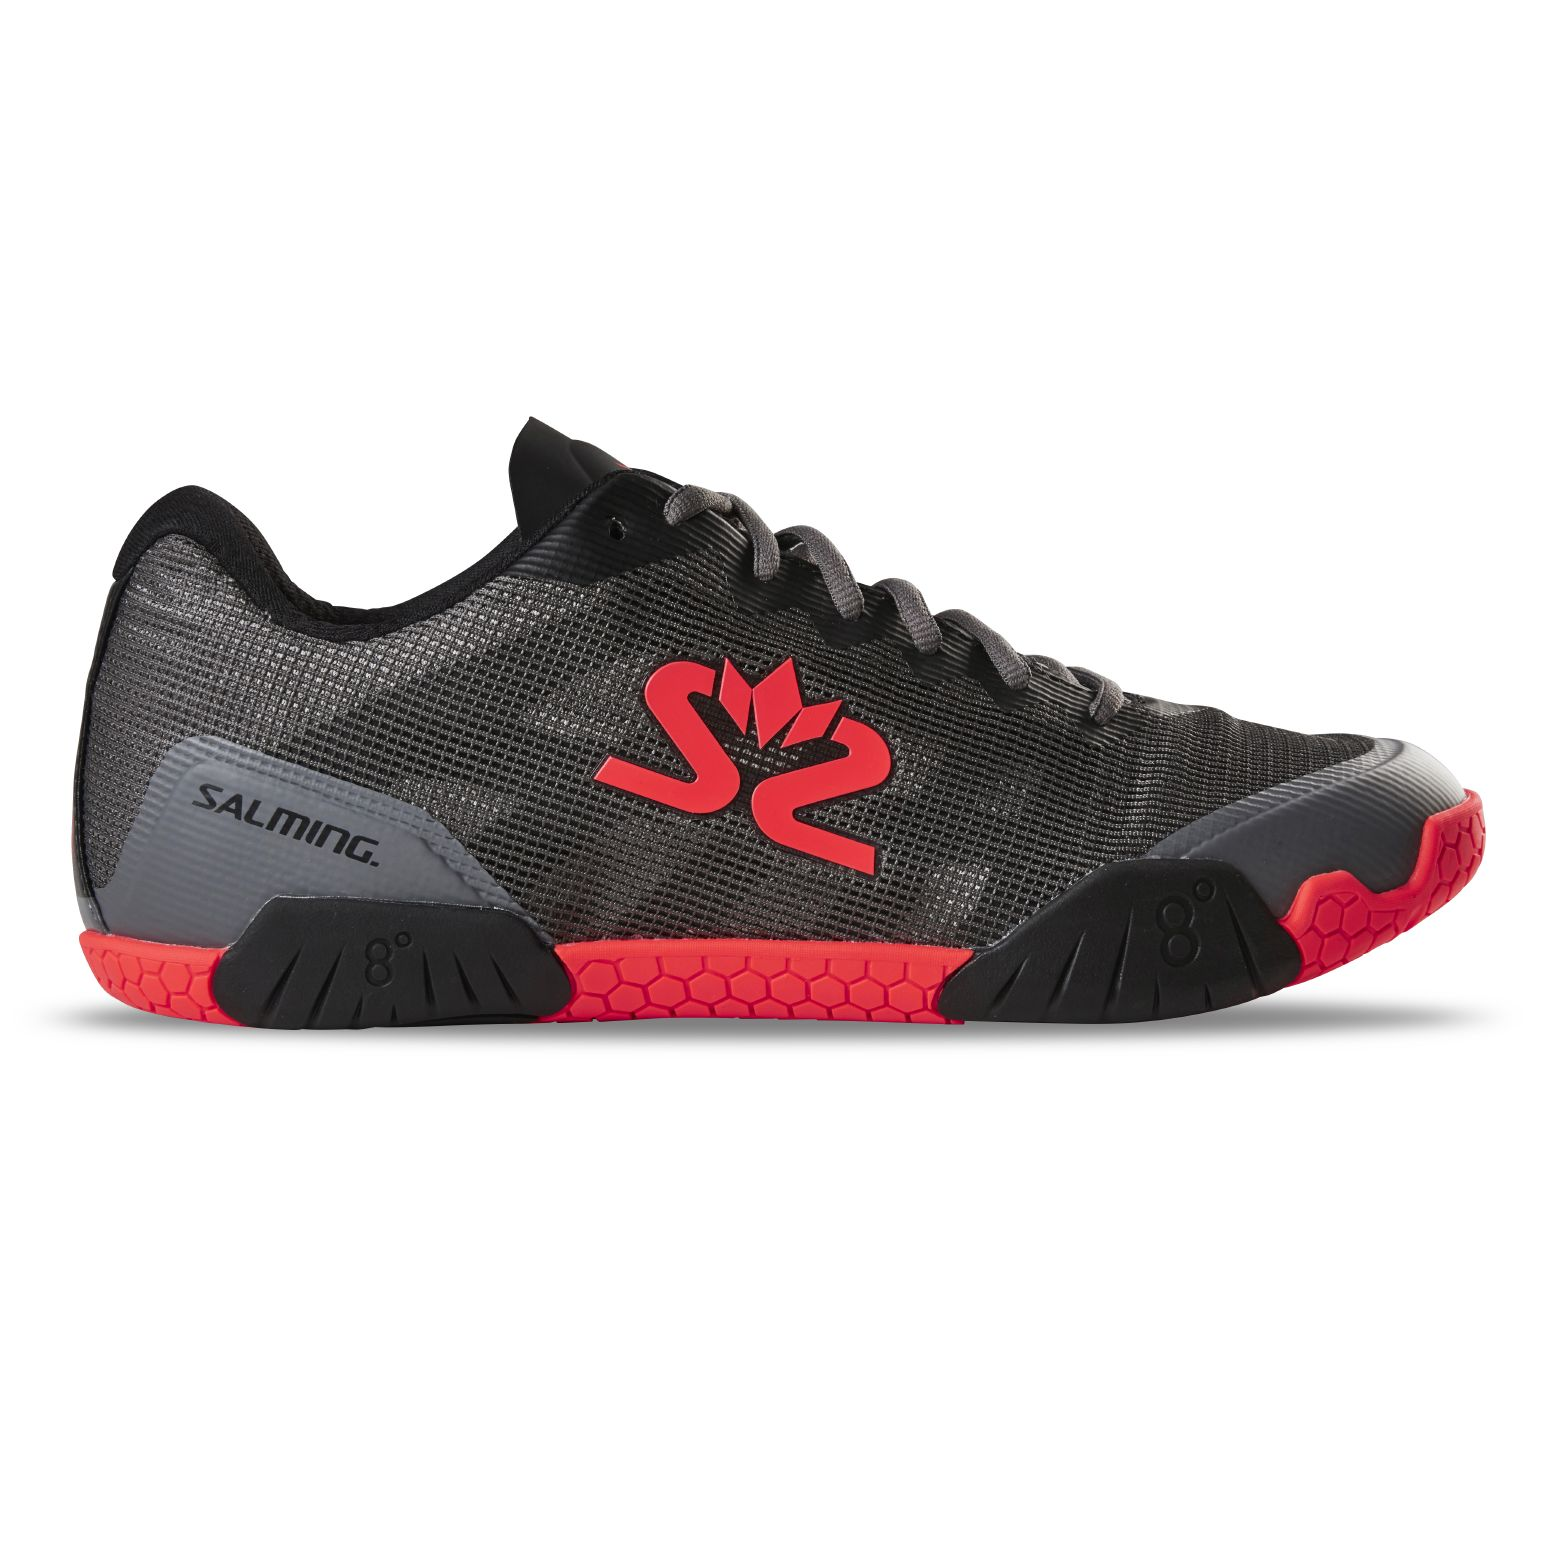 Salming Hawk Shoe Men GunMetal/Red 7,5 UK - 42 EUR - 26,5 cm